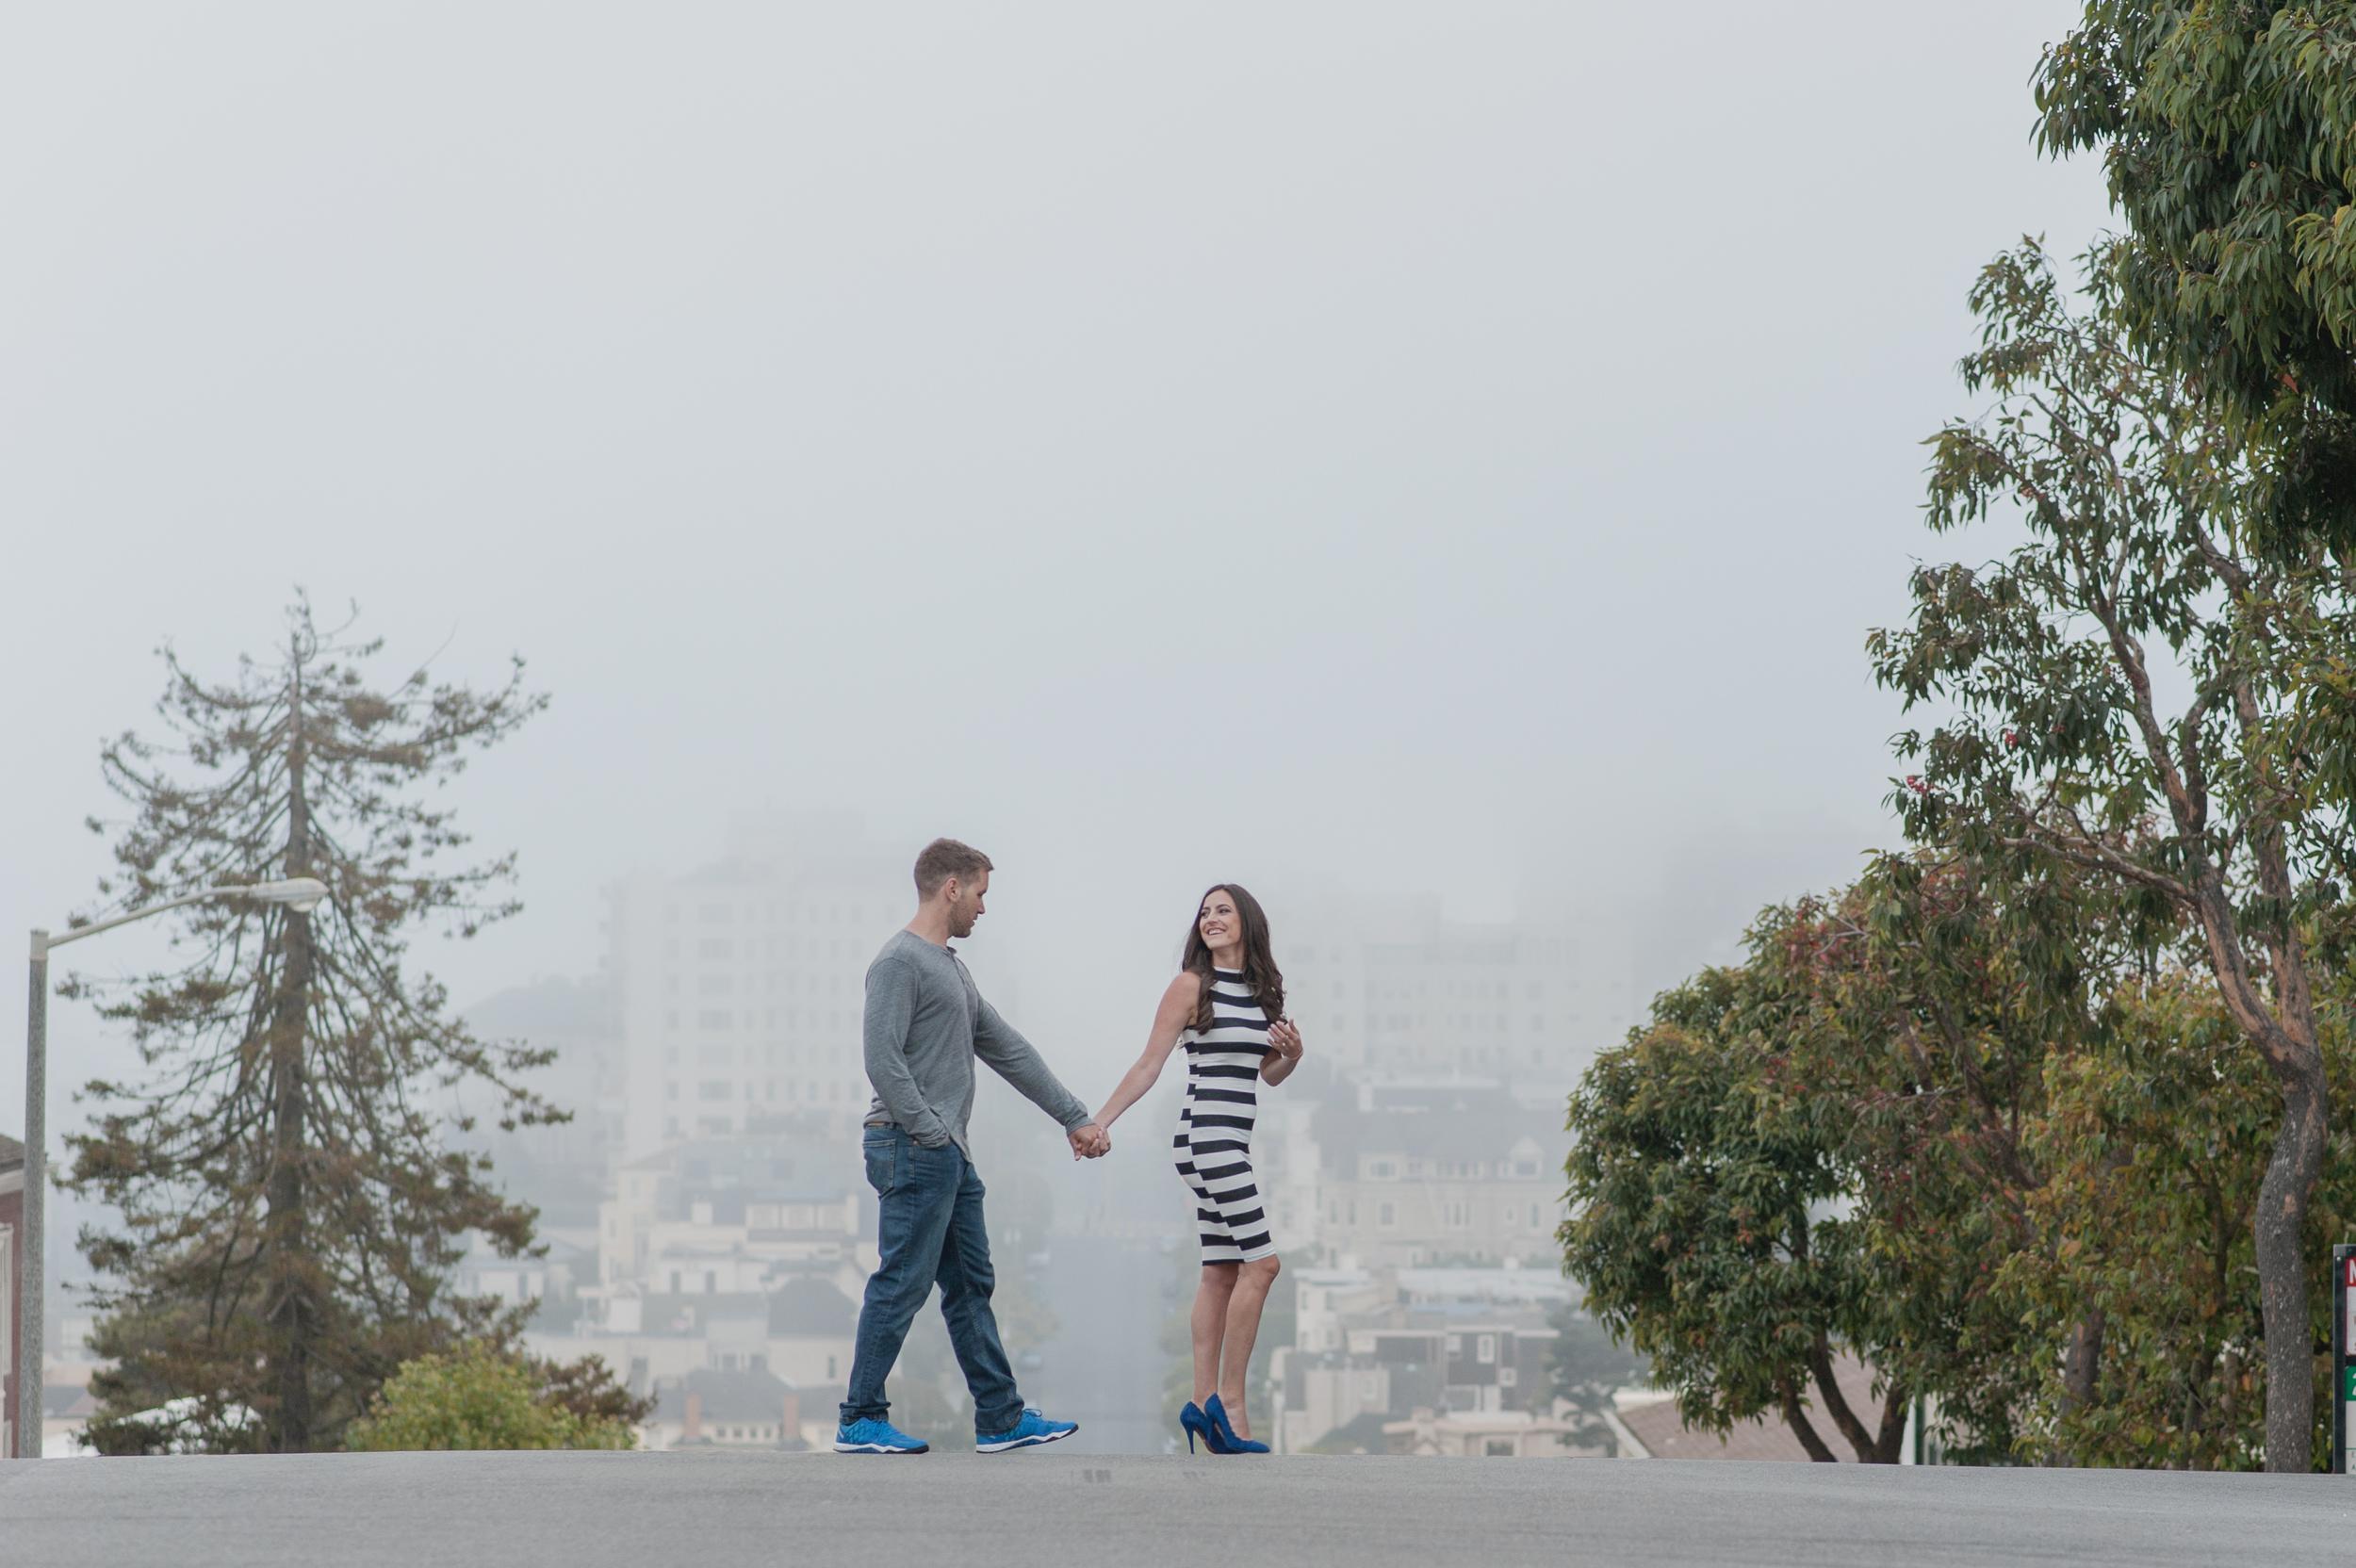 007-foggy-pacific-heights-san-francisco-engagement-vivianchen.jpg